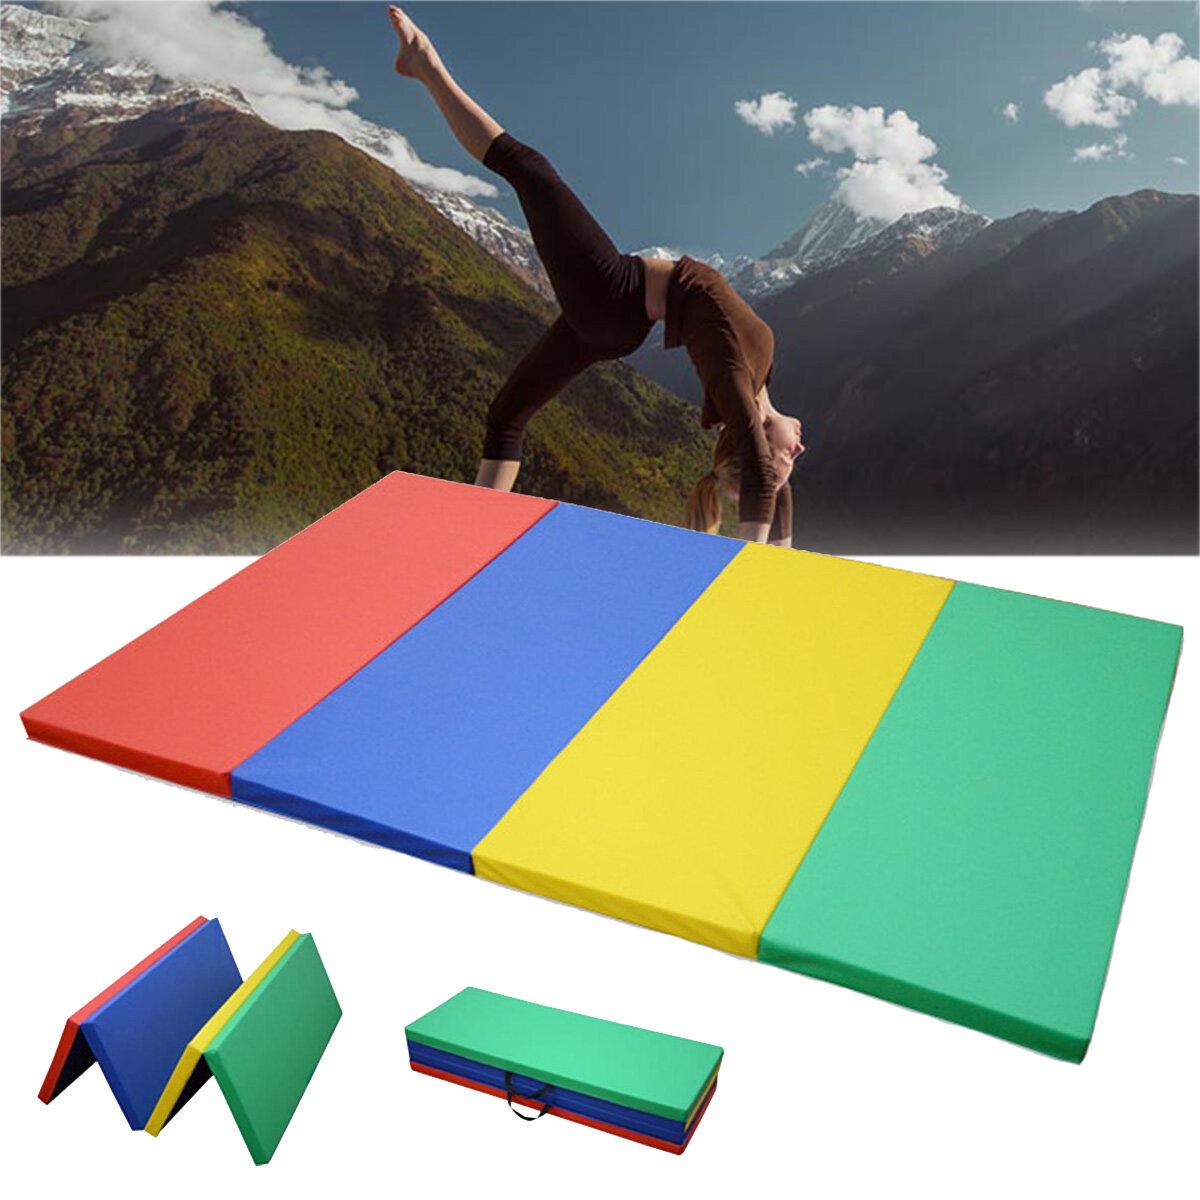 70x47x1.97inch Folding Gymnastics Panel Gym Exercise Yoga Pad Tumbling Fitness Mat